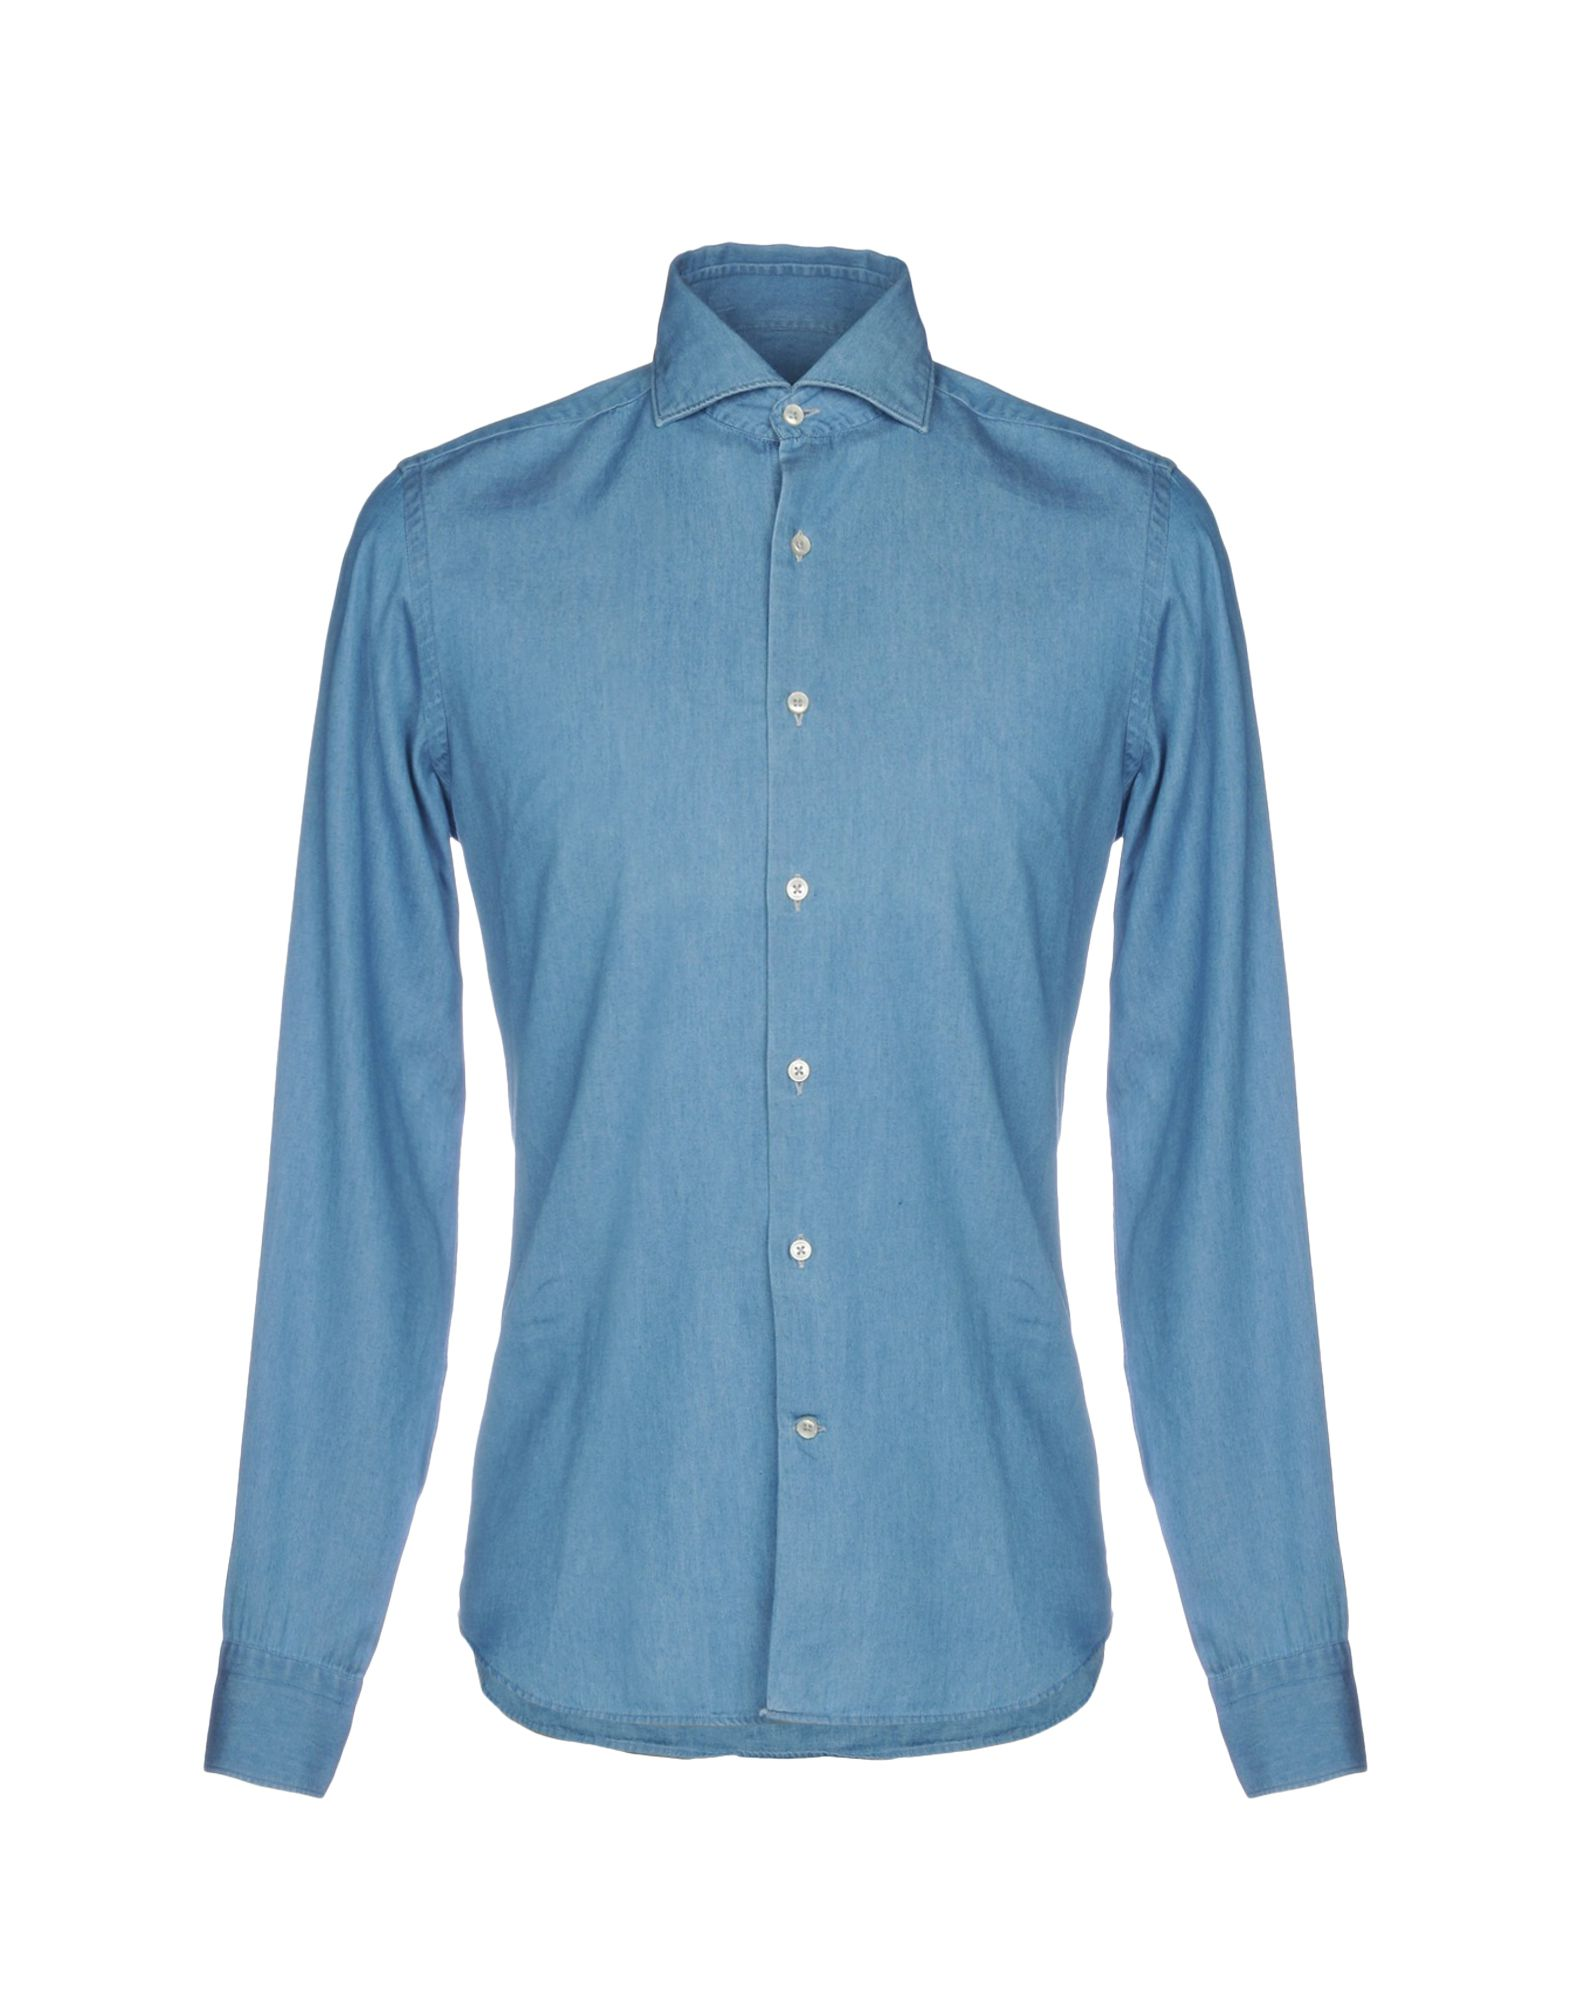 SPRING STREET Джинсовая рубашка цена